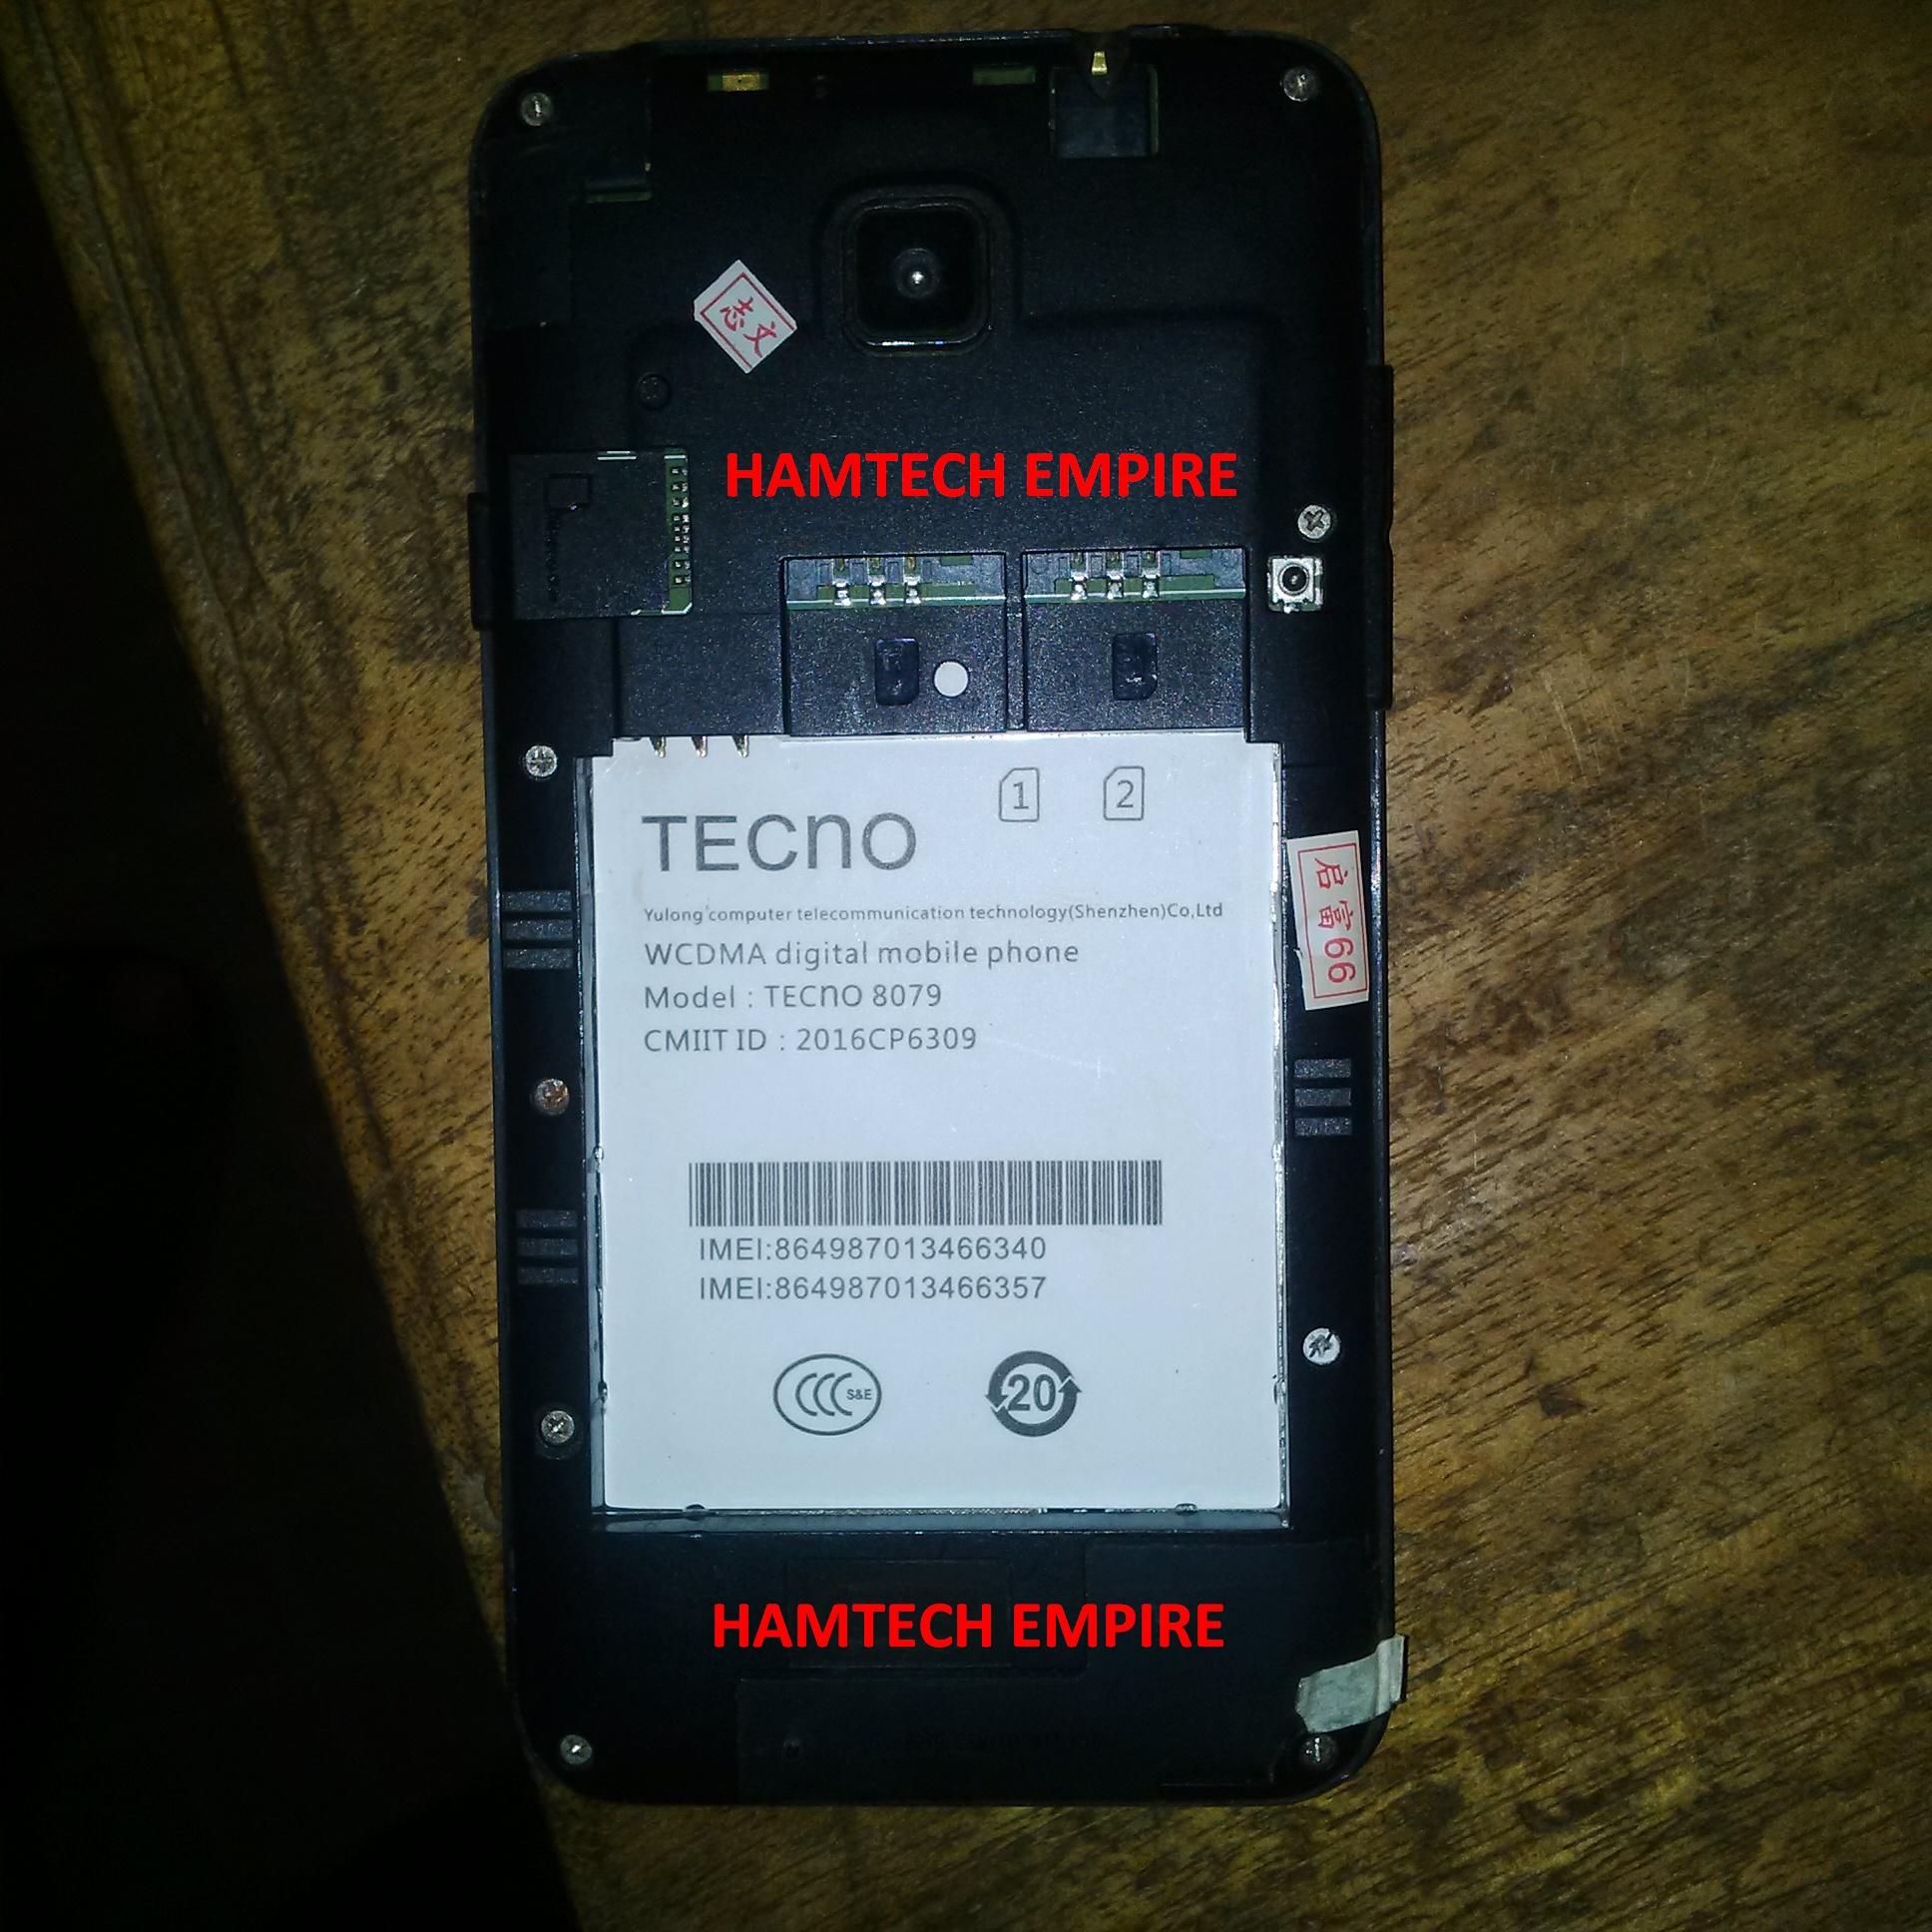 TECNO 8079 STOCK ROM FIRMWARE FLASH FILE - Needromng